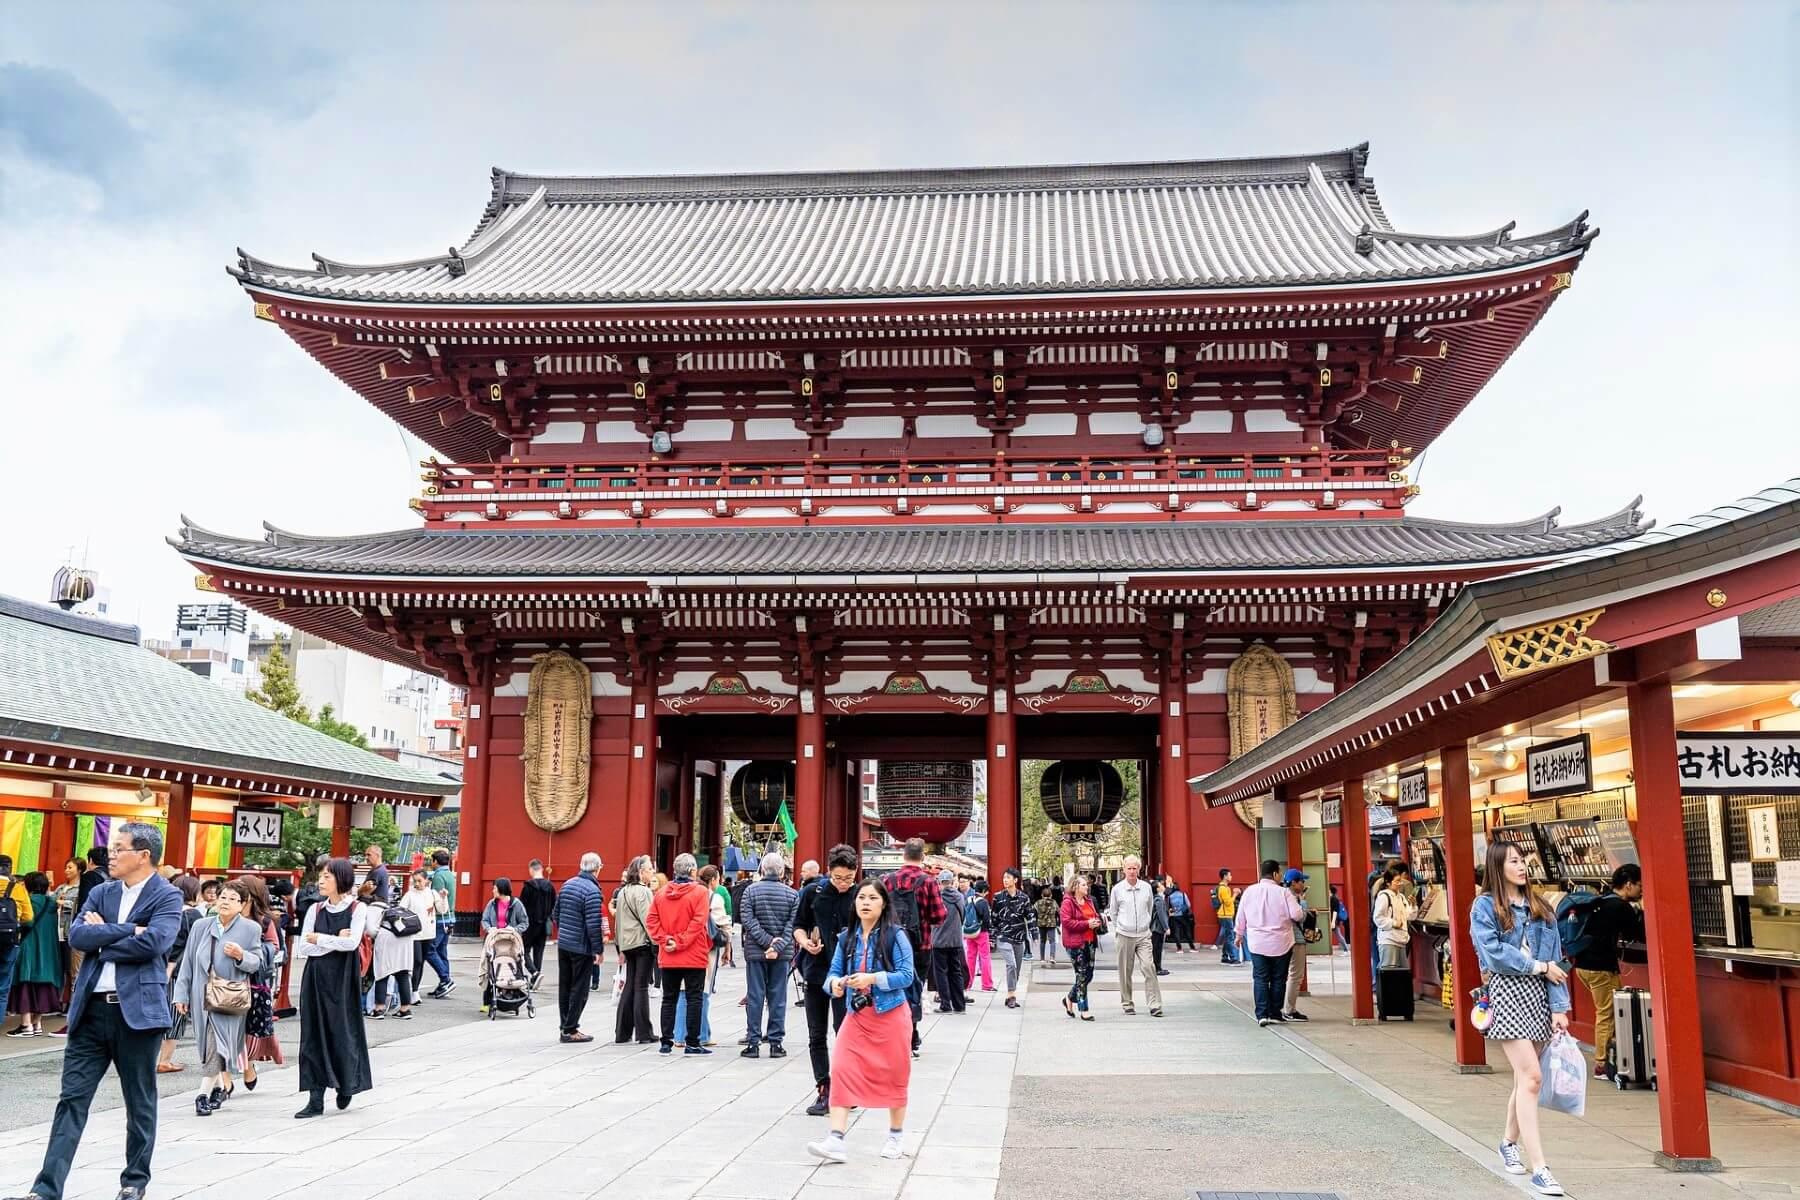 Travel Guide of the Sensoji Temple in Asakusa Tokyo, Japan